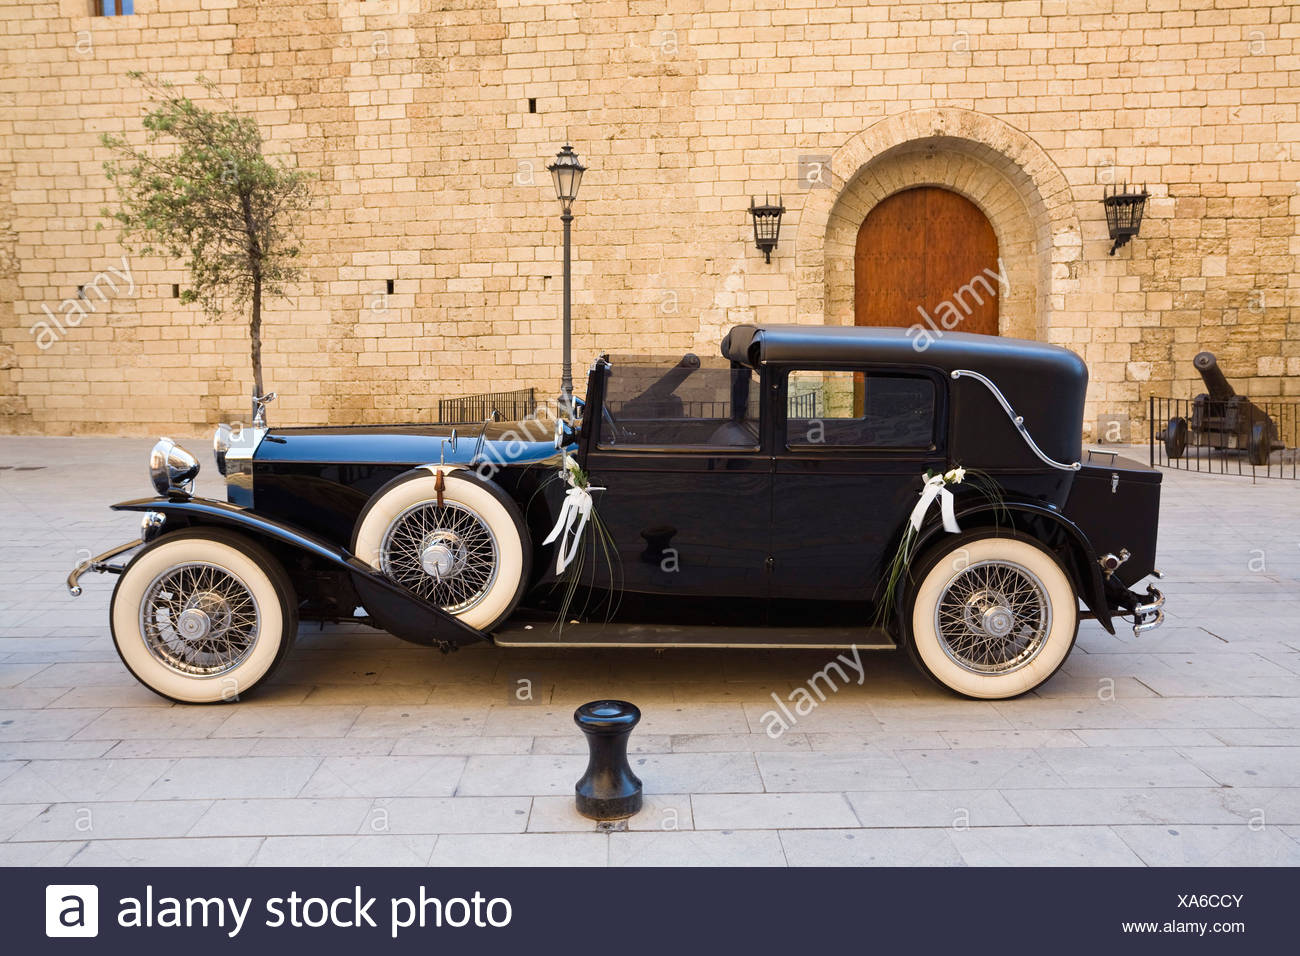 Classic car in front of the Cathedral La Seu at Palma, Mallorca, Majorca, Balearic Islands, Spain, Europe - Stock Image